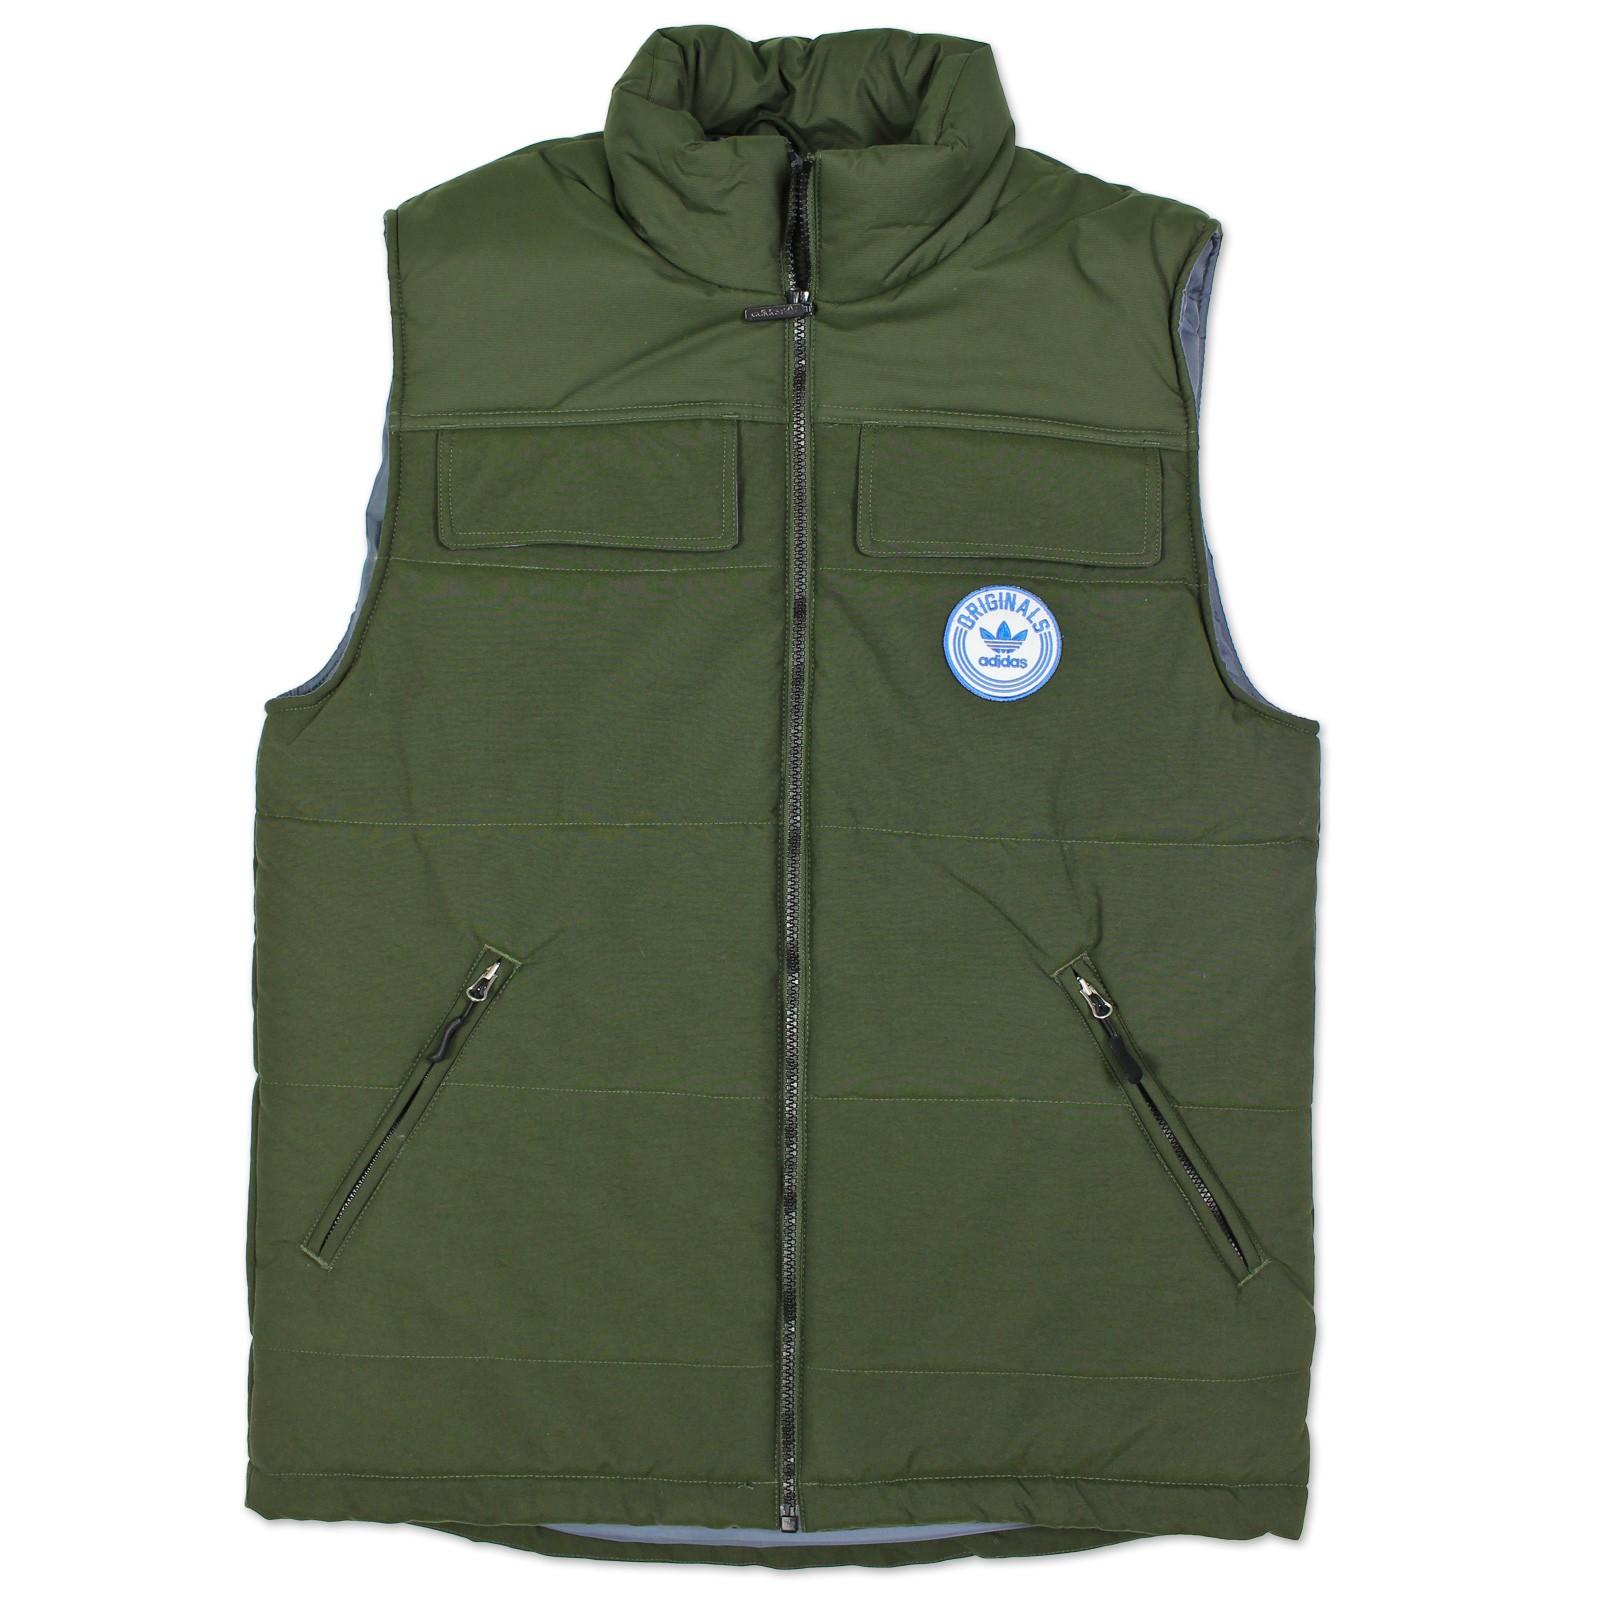 adidas Originals Mens Winter Vest Down Vest Trefoil Jacket